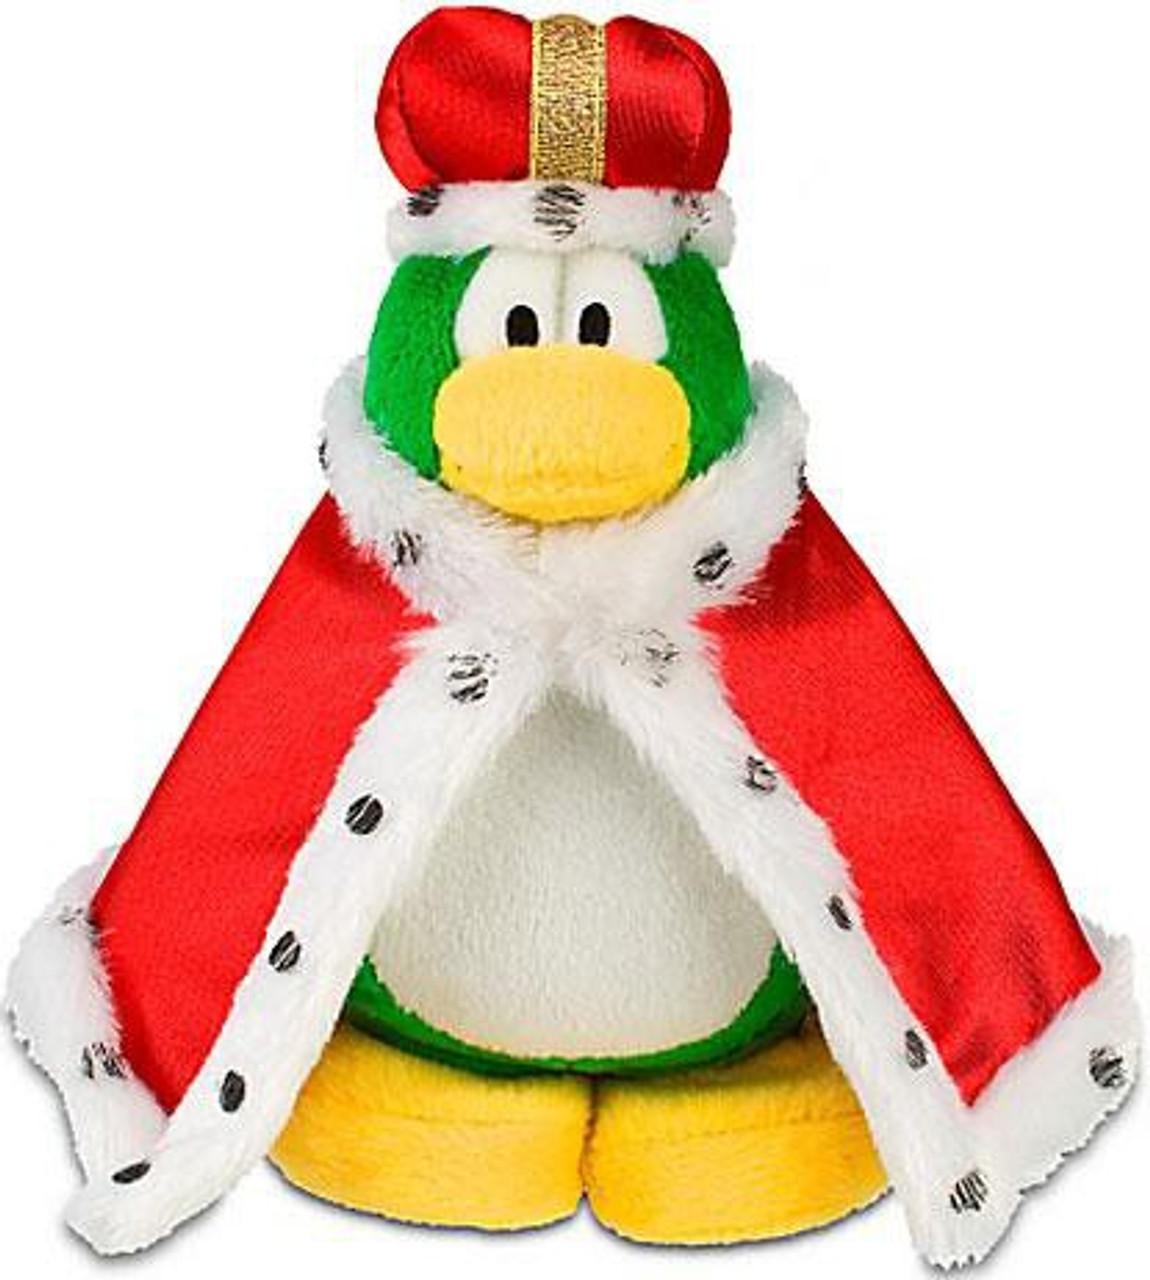 Club Penguin Series 11 King Roi 6.5-Inch Plush Figure [Version 2]